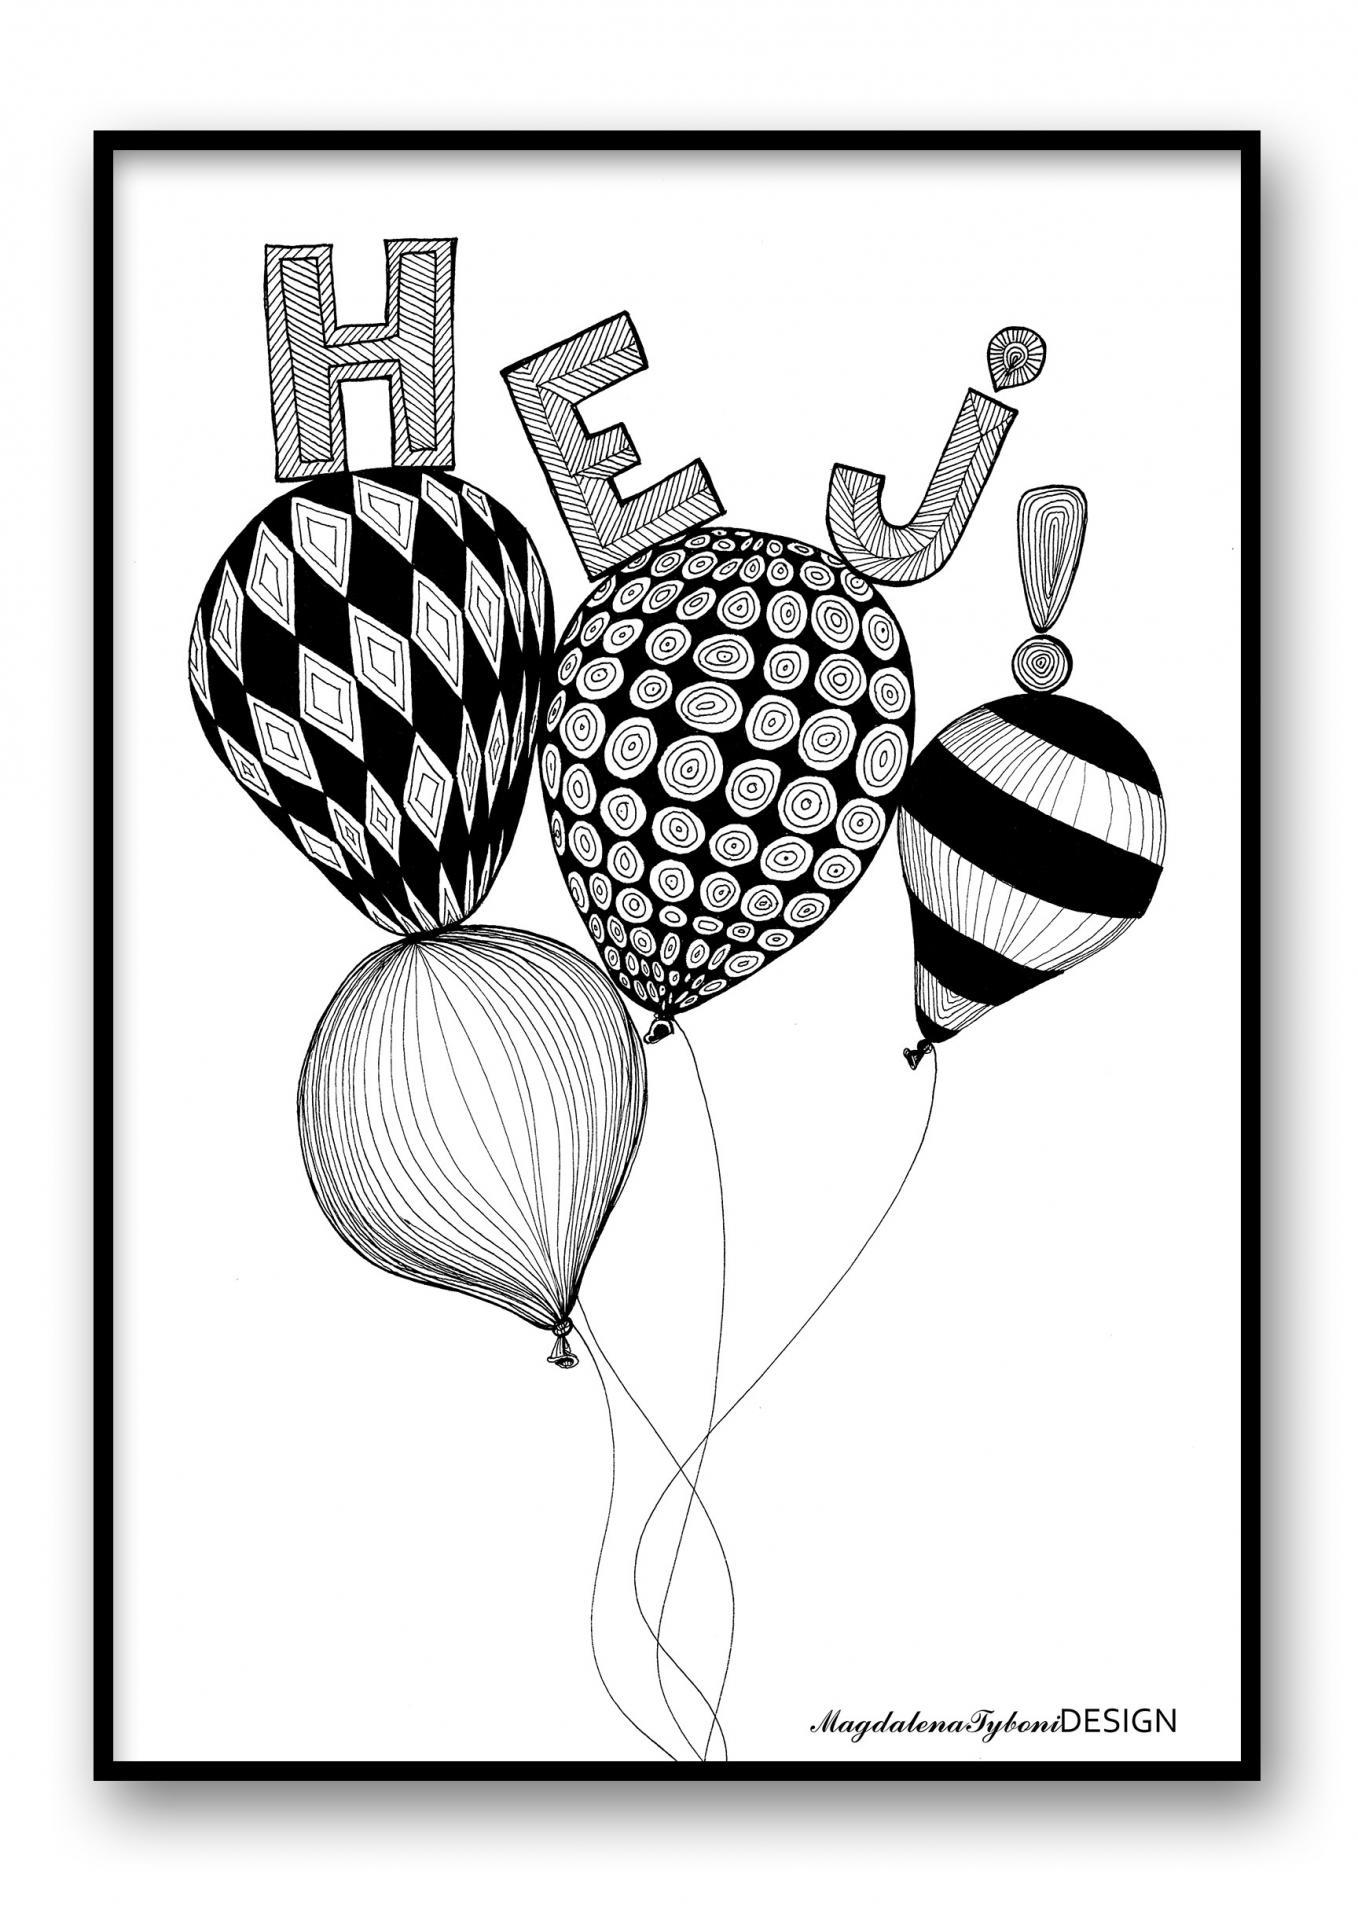 Magdalena Tyboni DESIGN Plakát Hej! 30 x 40 cm